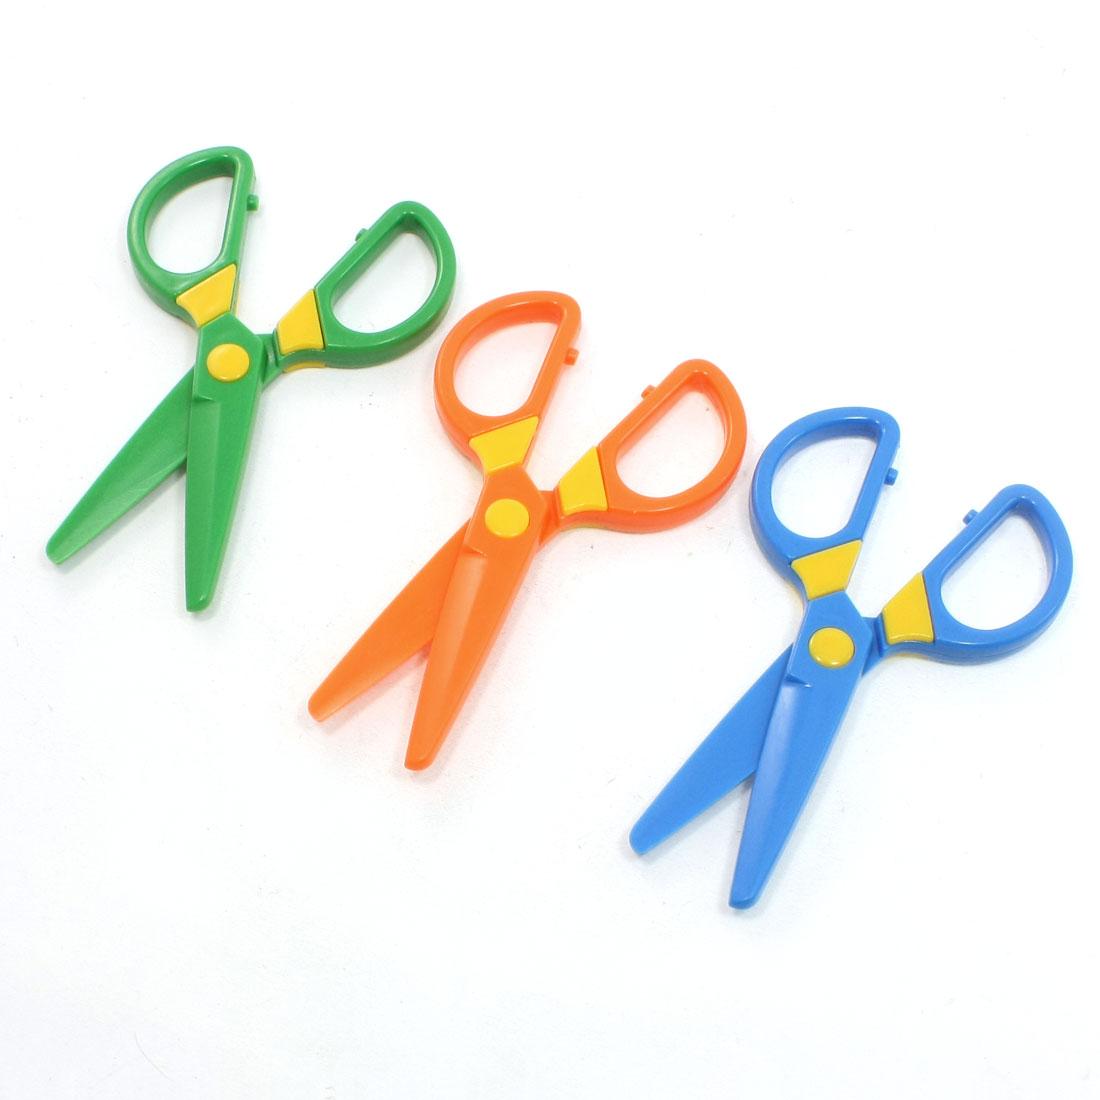 3 Pcs Blue Orange Green Whole Plastic Scissors for Children